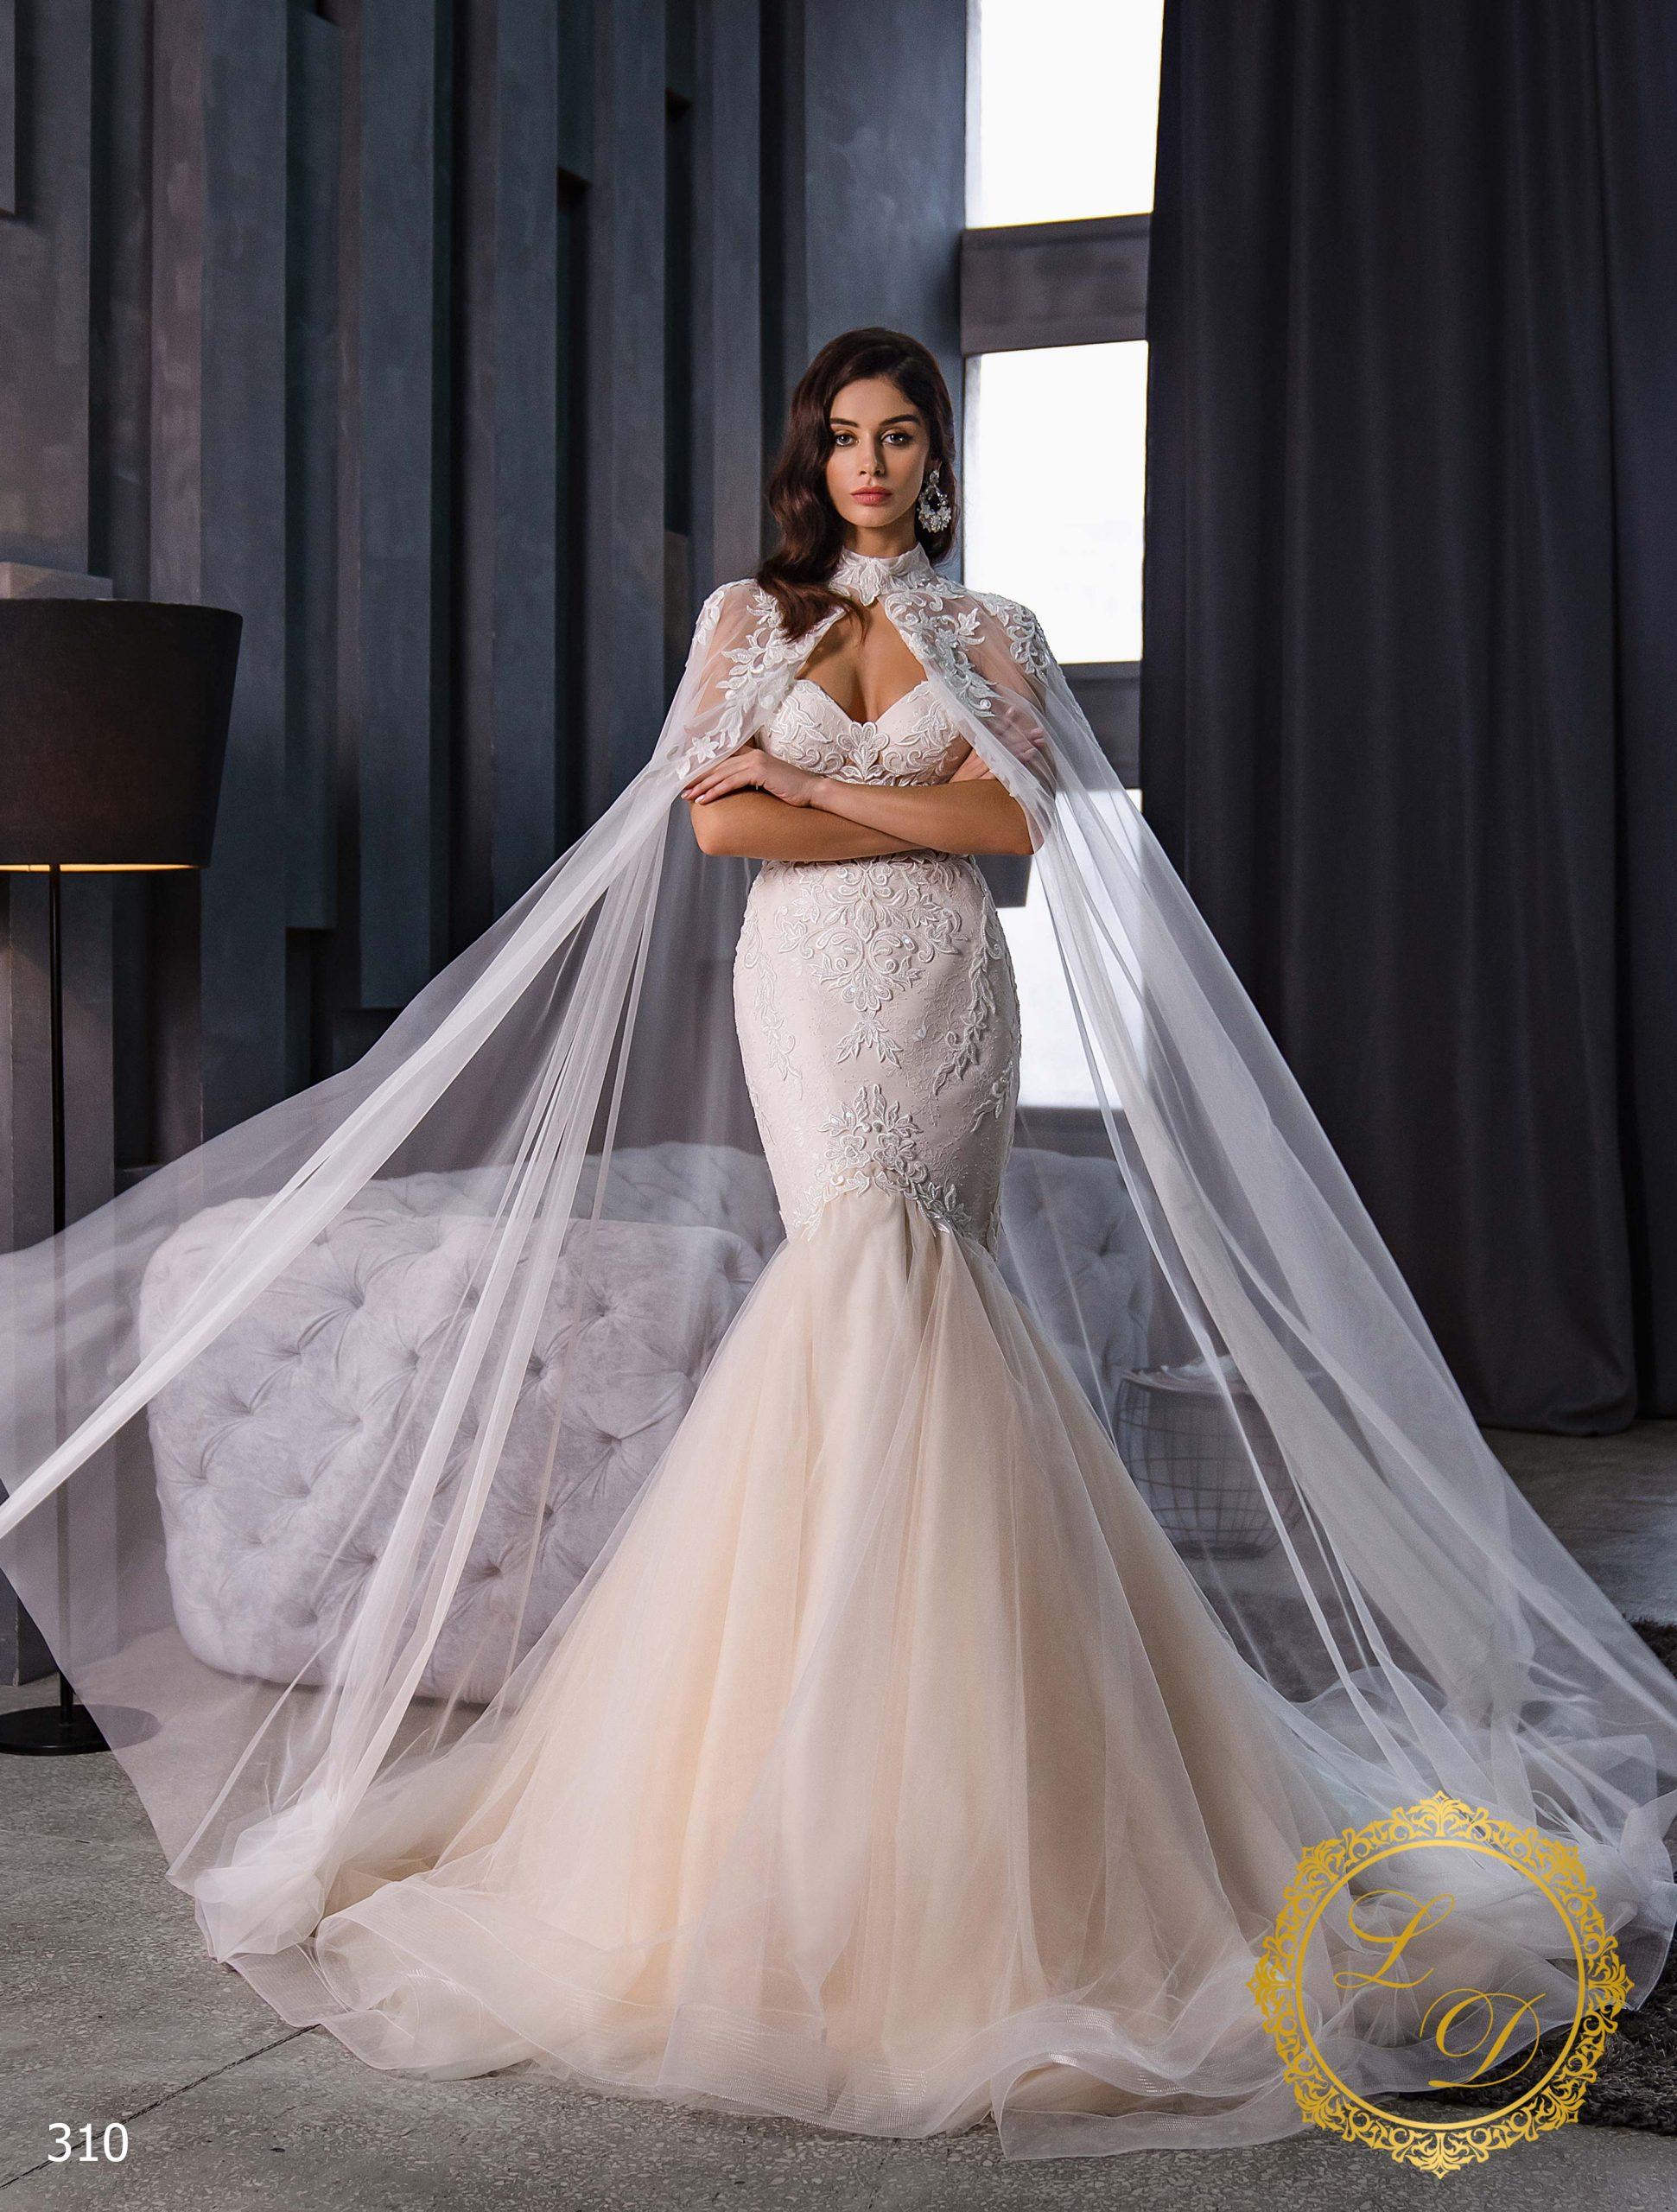 Wedding Dress Lady Di 310-1